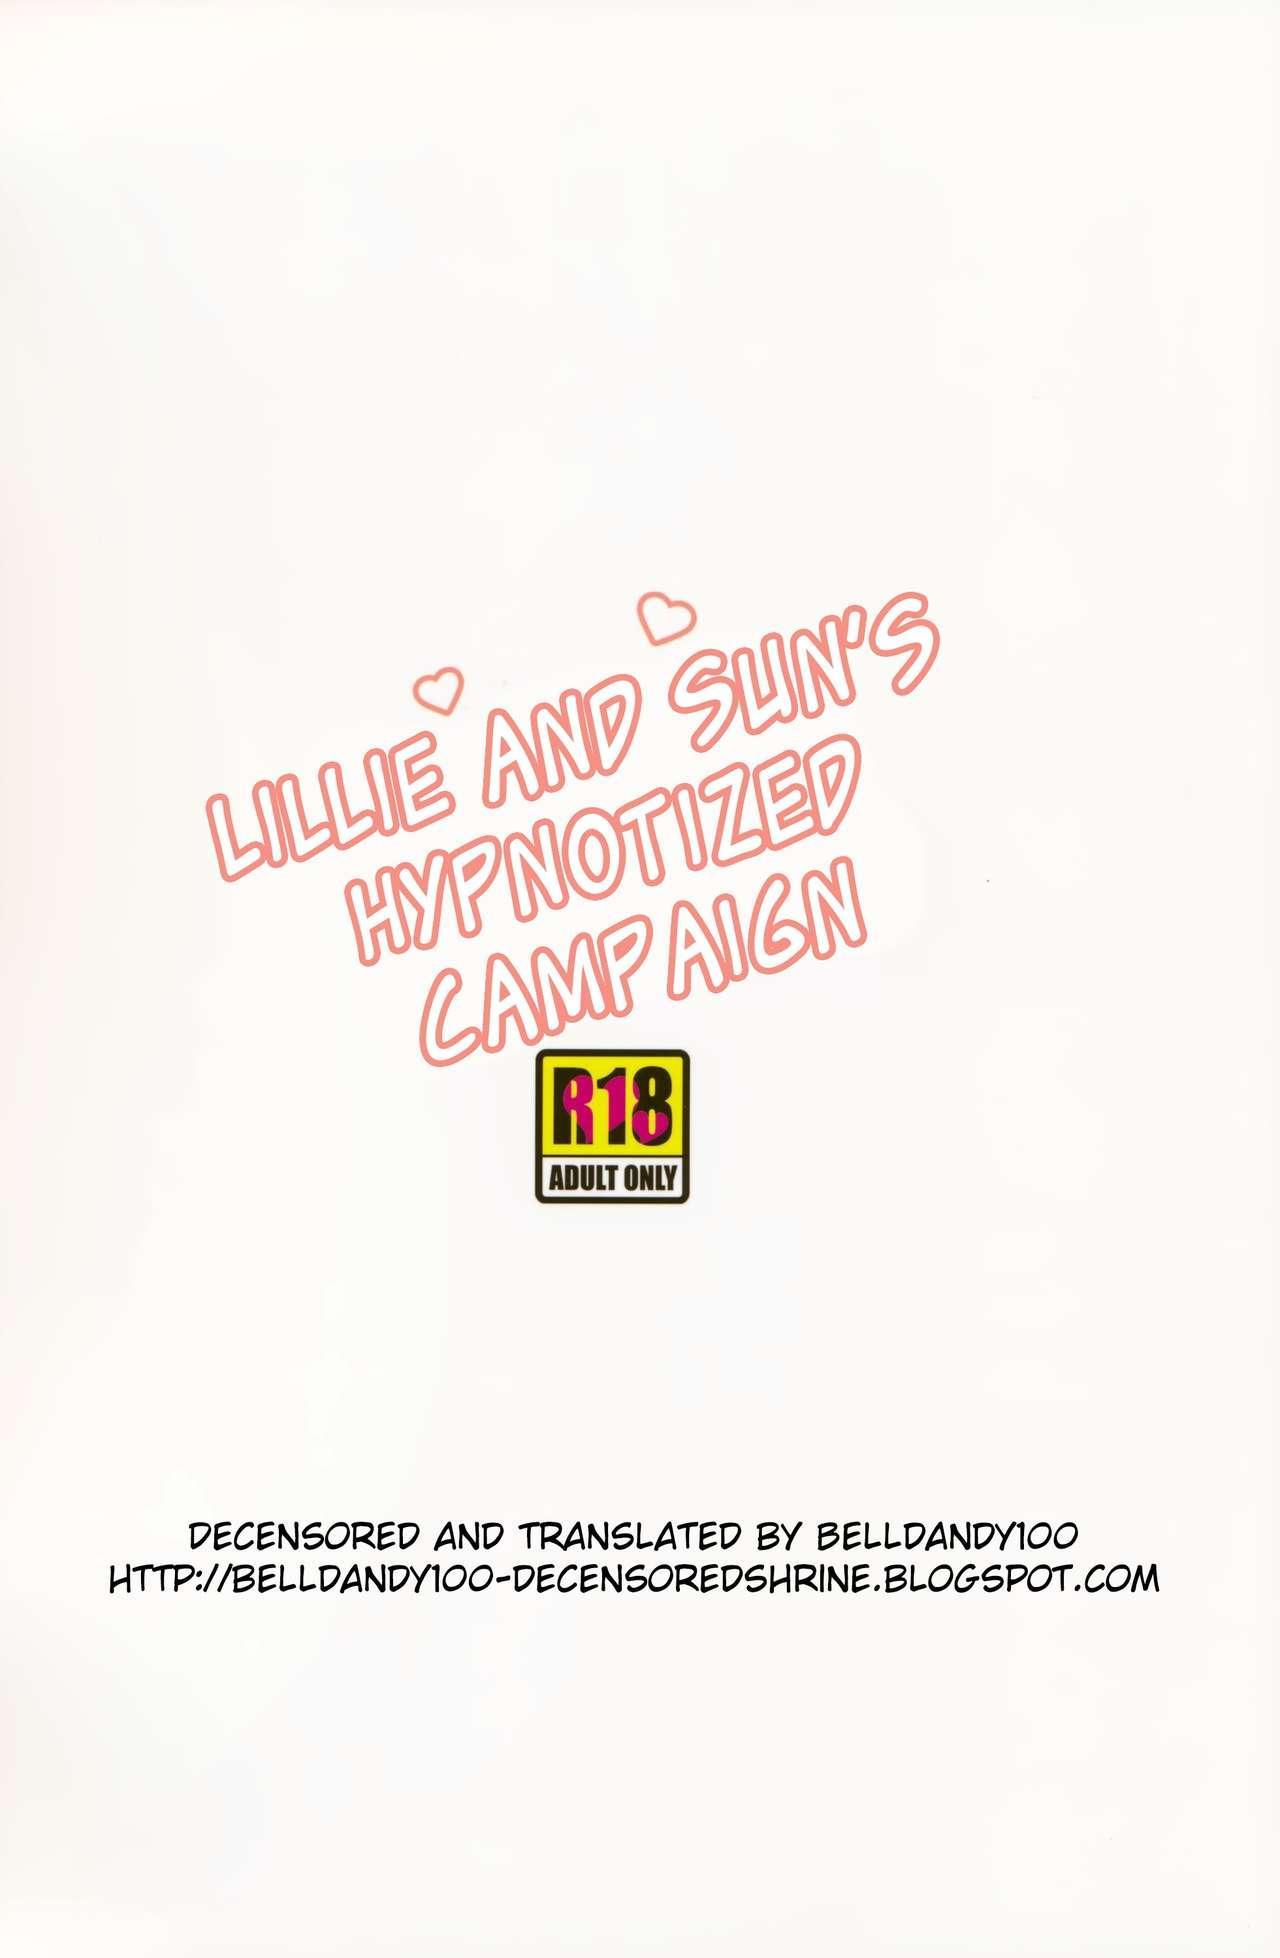 Lillie to Sun no Saimin Daisakusen - Lillie and Sun's Hypnotized Campaign 30